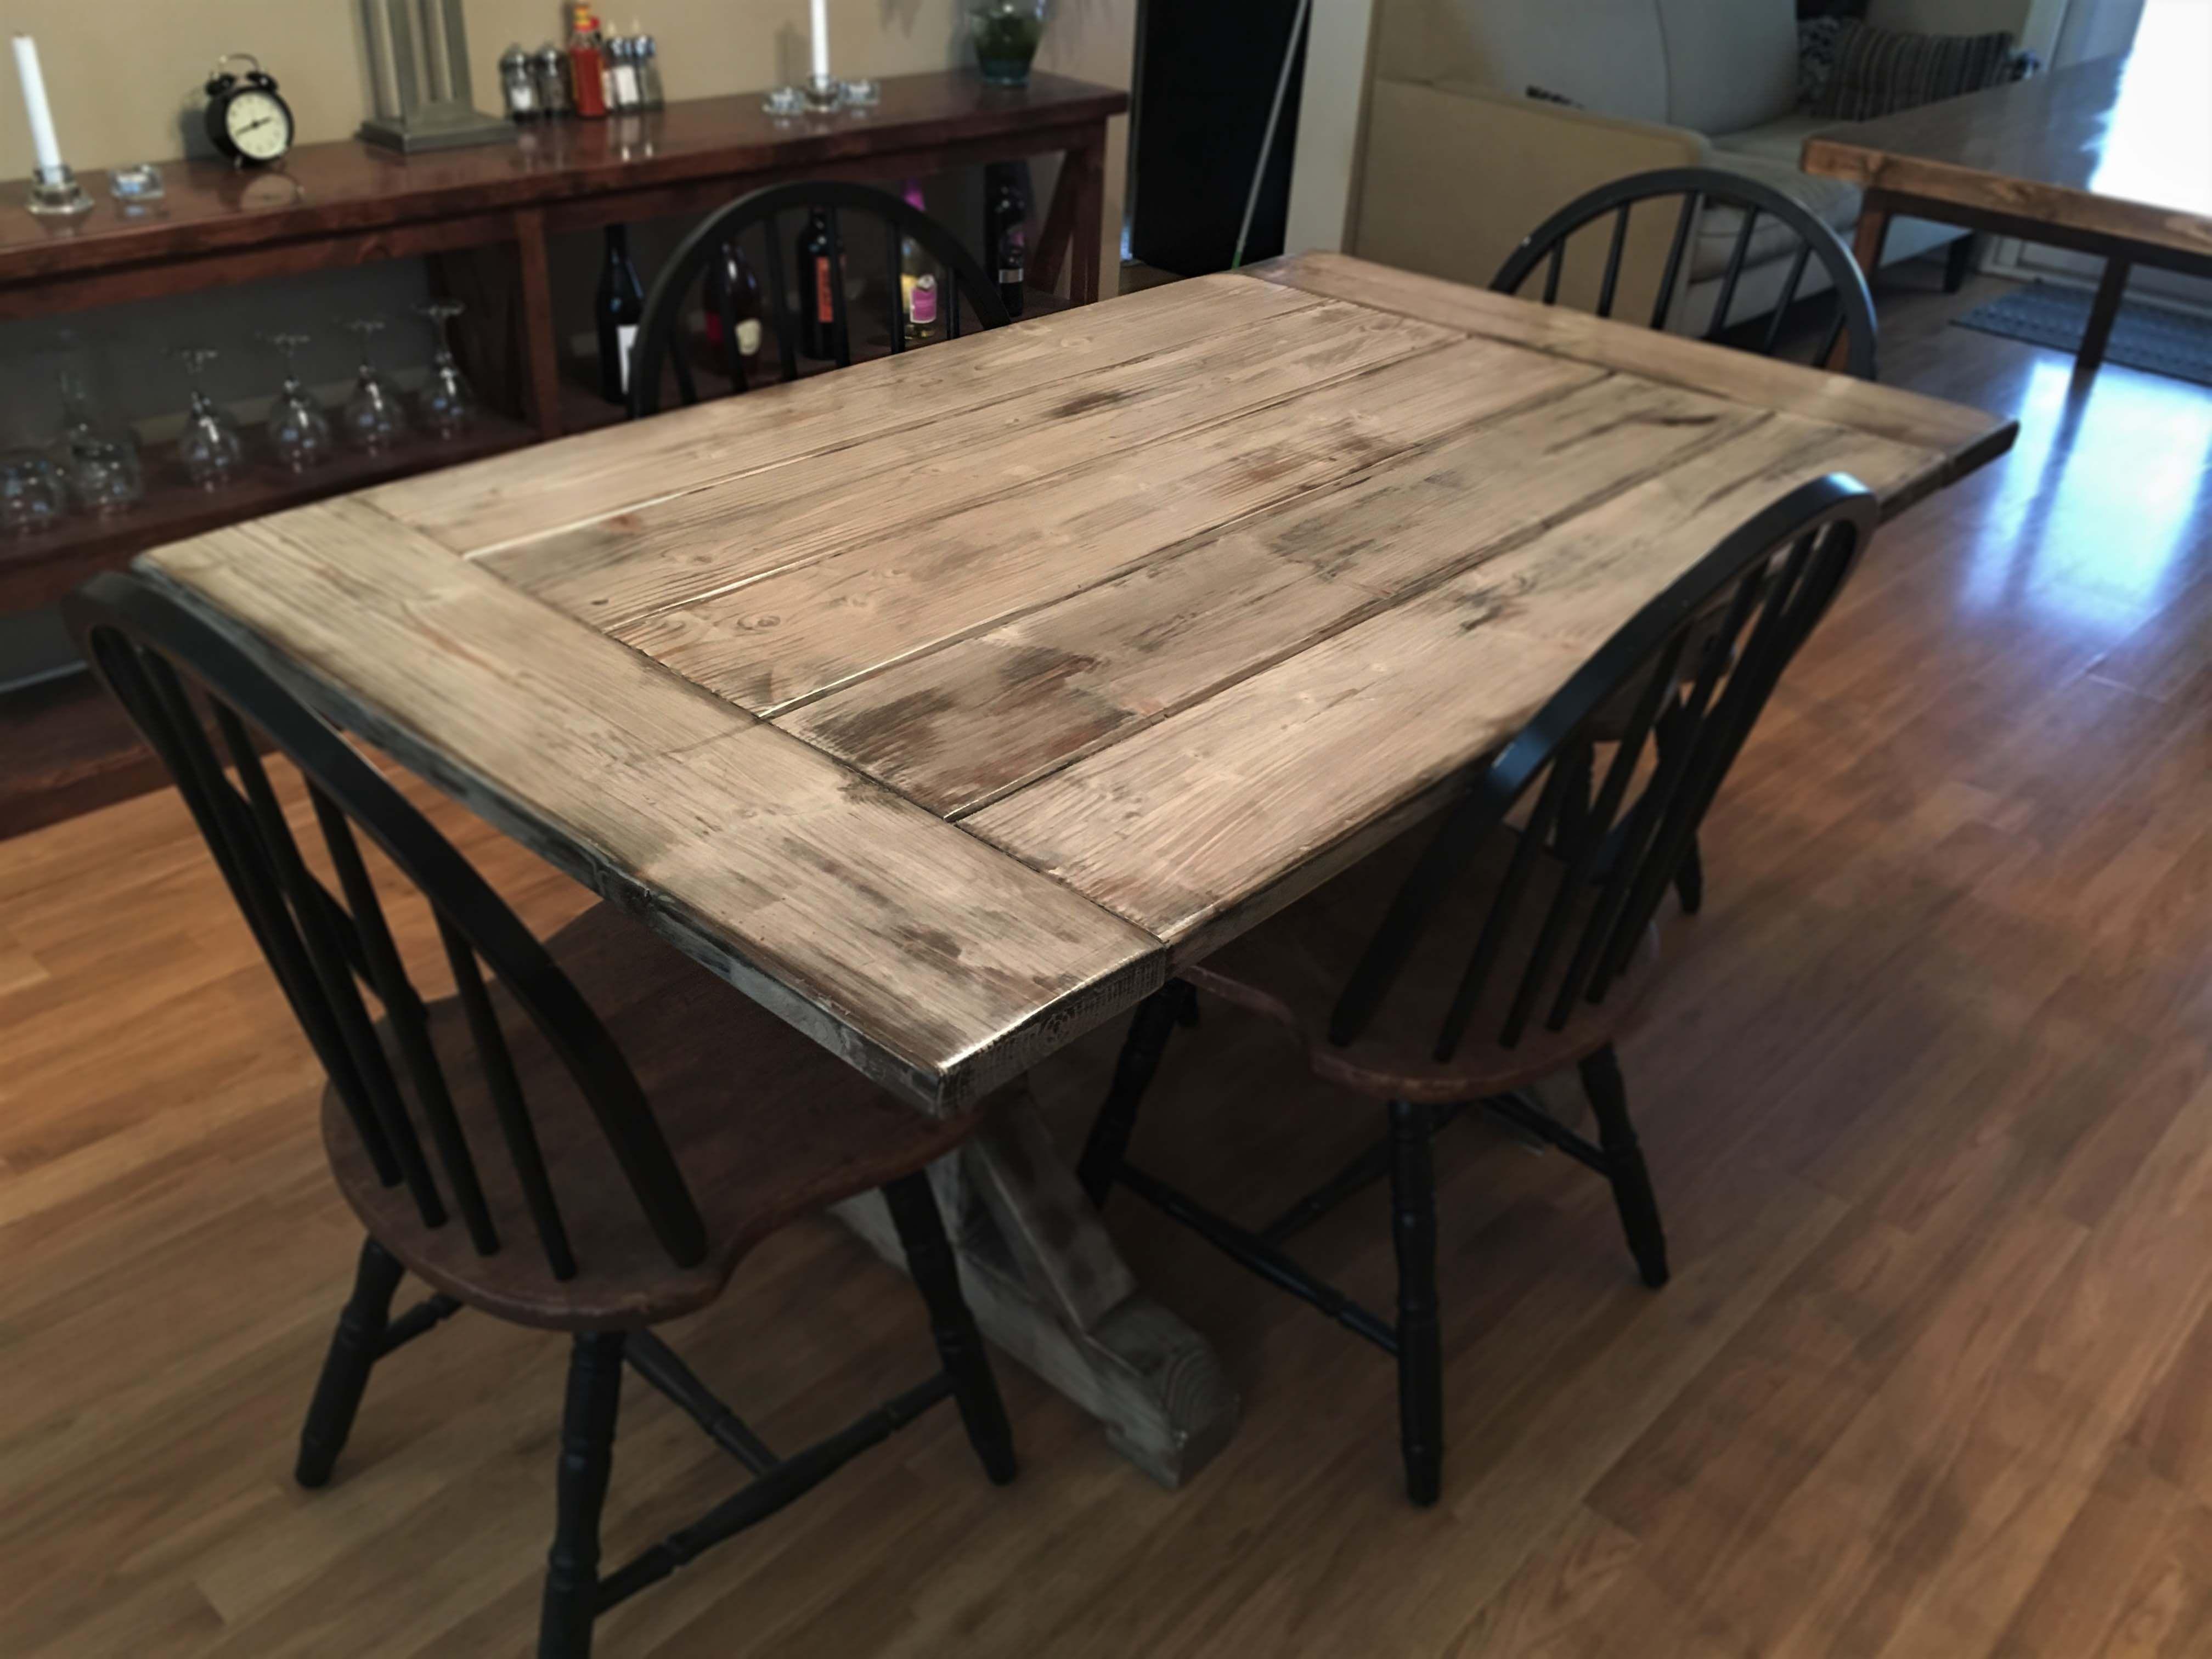 Hand Made Distressed Wood IndoorOutdoor Farmhouse Table W Trestle - Farm table trestle base